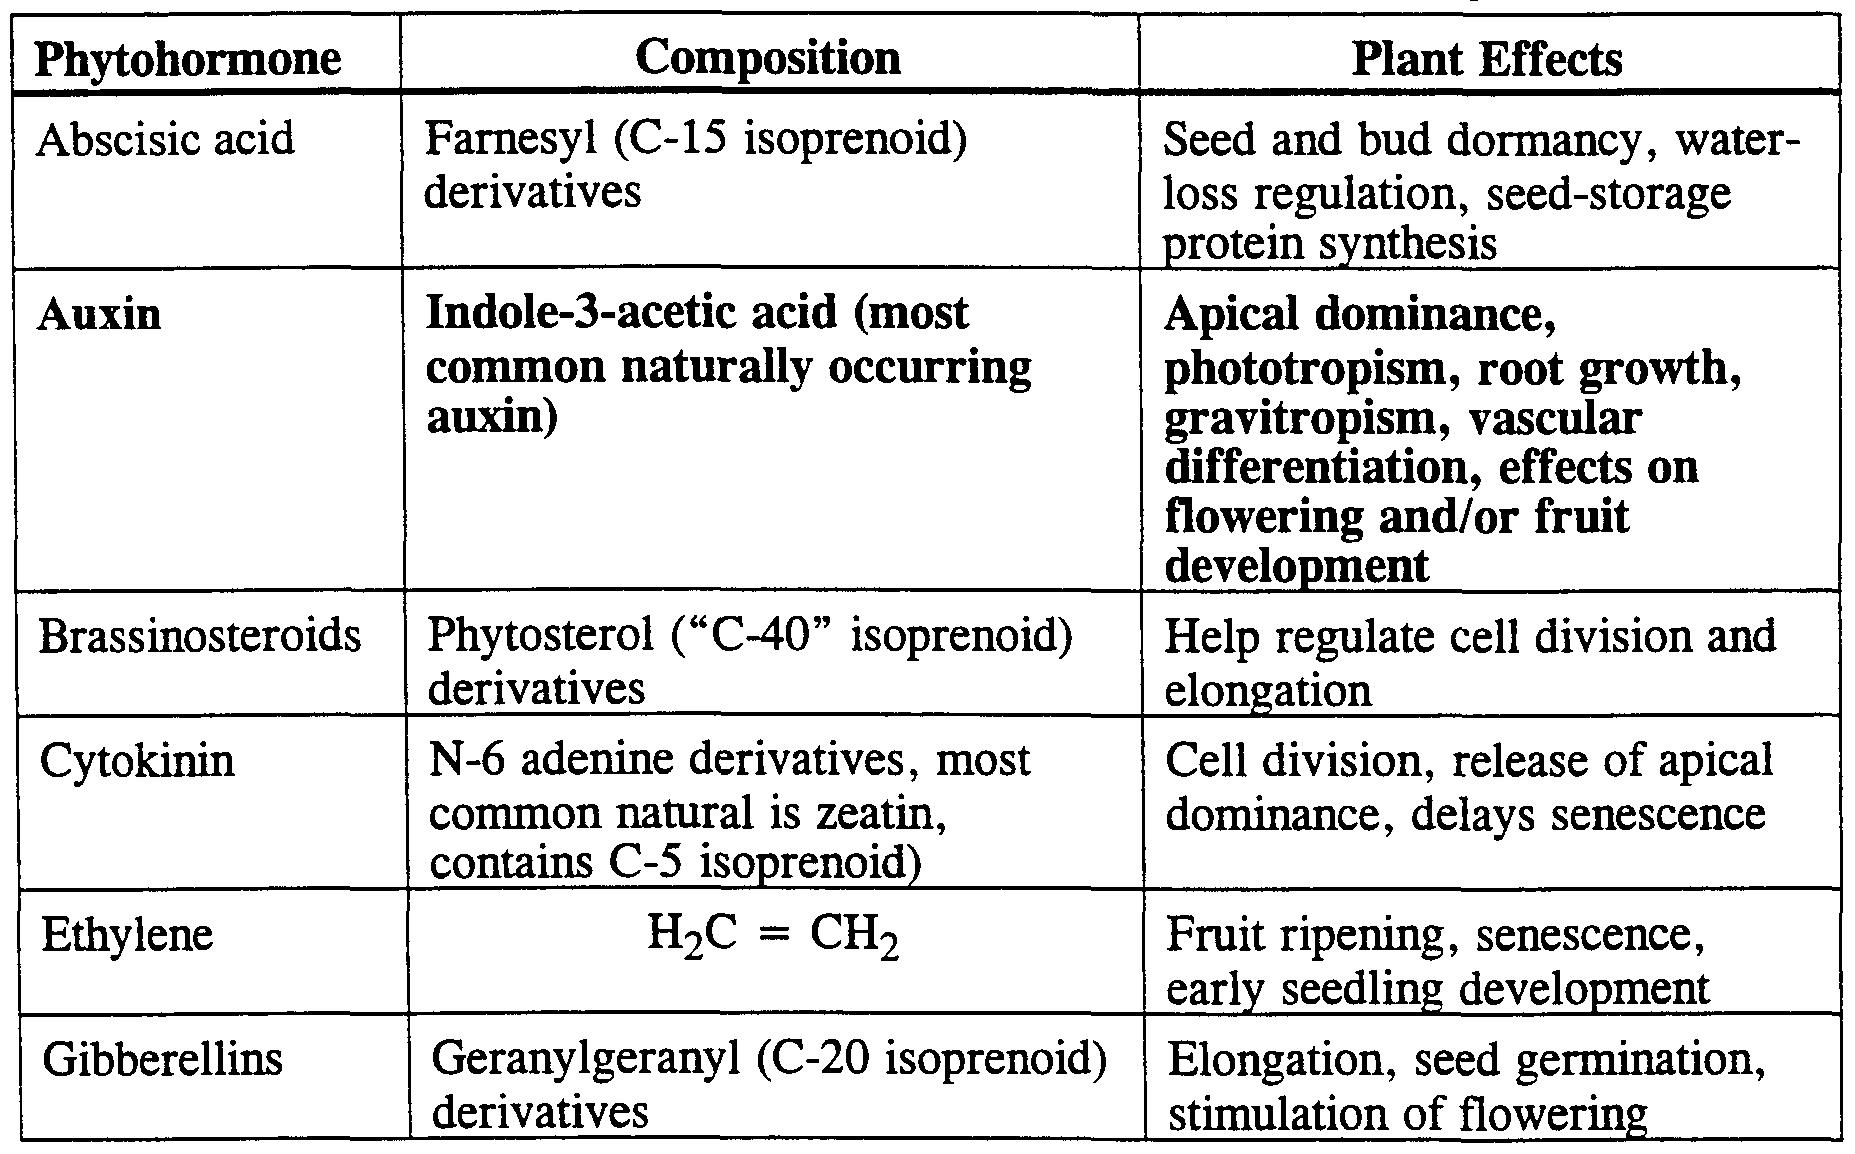 brassinosteroids essential regulators of plant growth and development